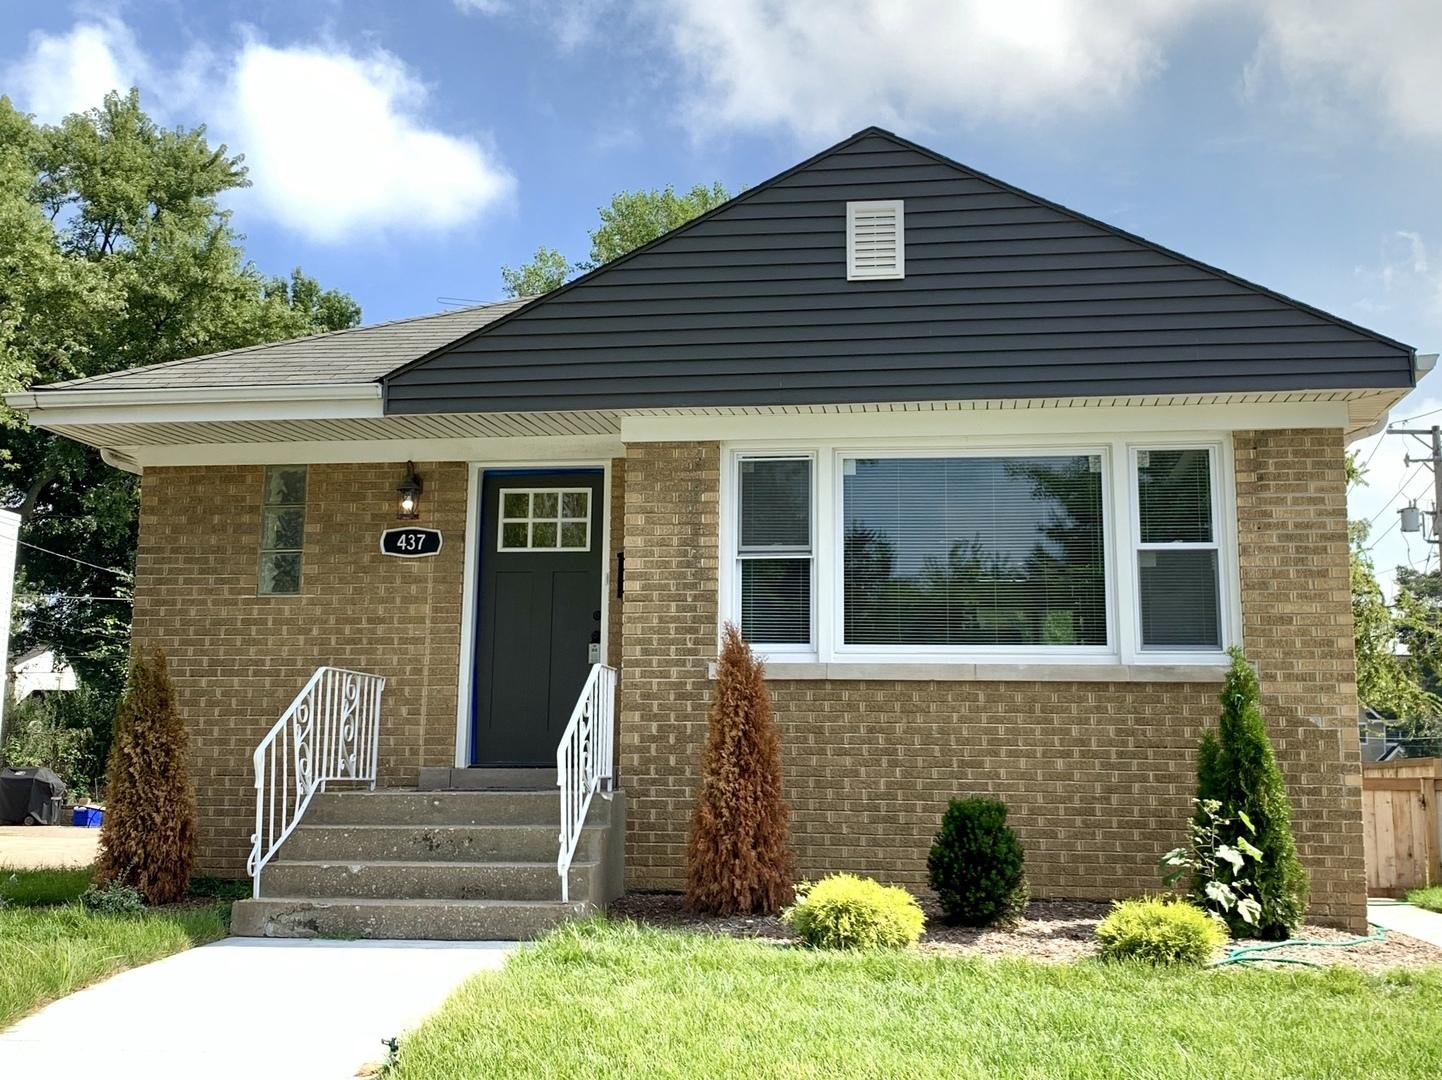 437 South Gilbert Avenue 60525 - One of La Grange Homes for Sale